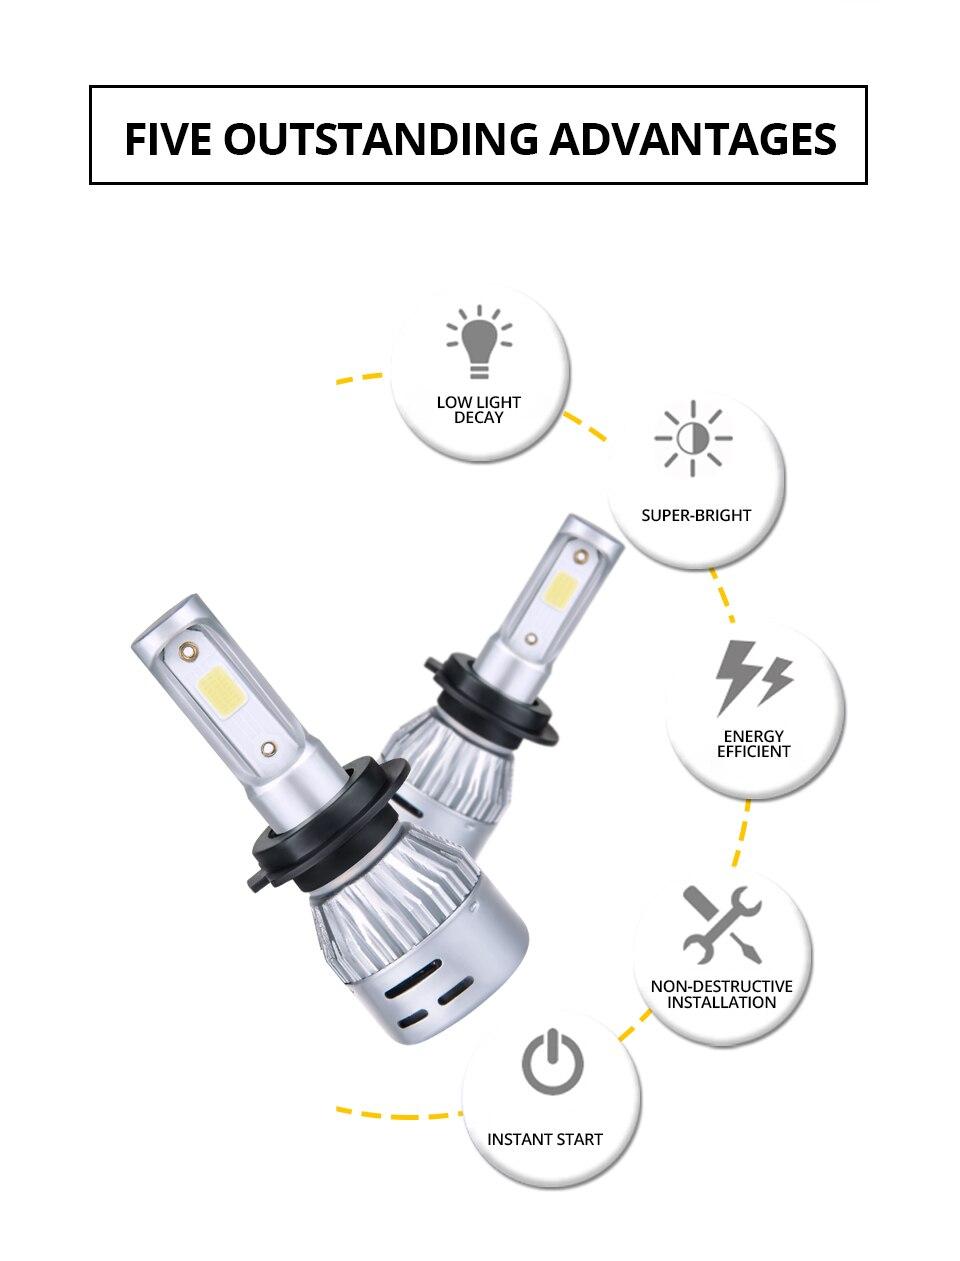 Aceersun H4 LED H7 Car Headlight H1 H8 H9 9005 9006 8000lm 4300K 6500K MINI 72W Auto Hi Lo Beam 12V And 5V USB Small stage light (2)